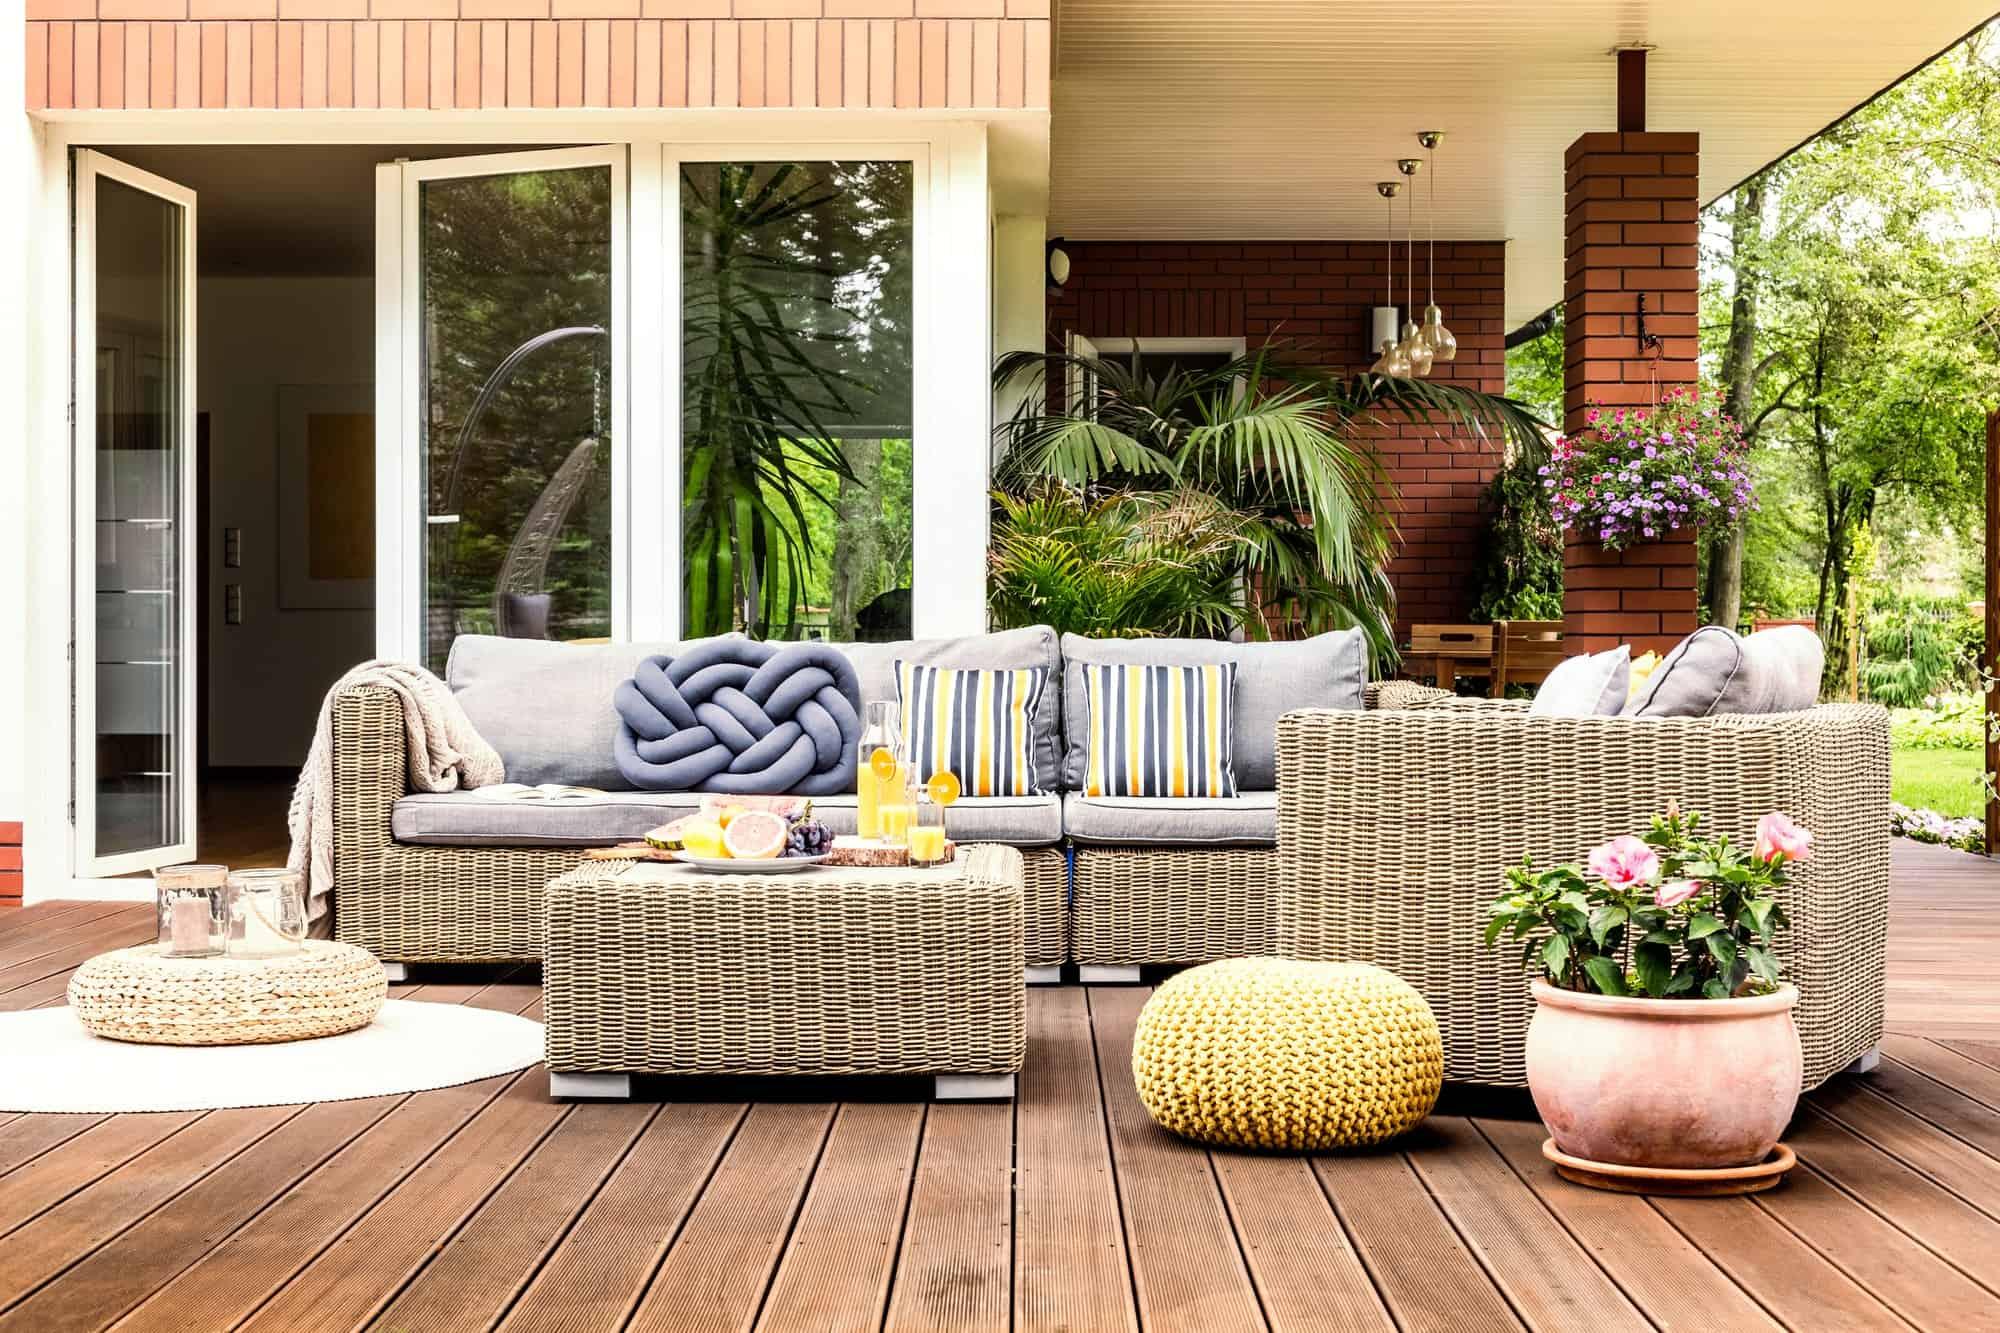 Beige garden furniture on terrace